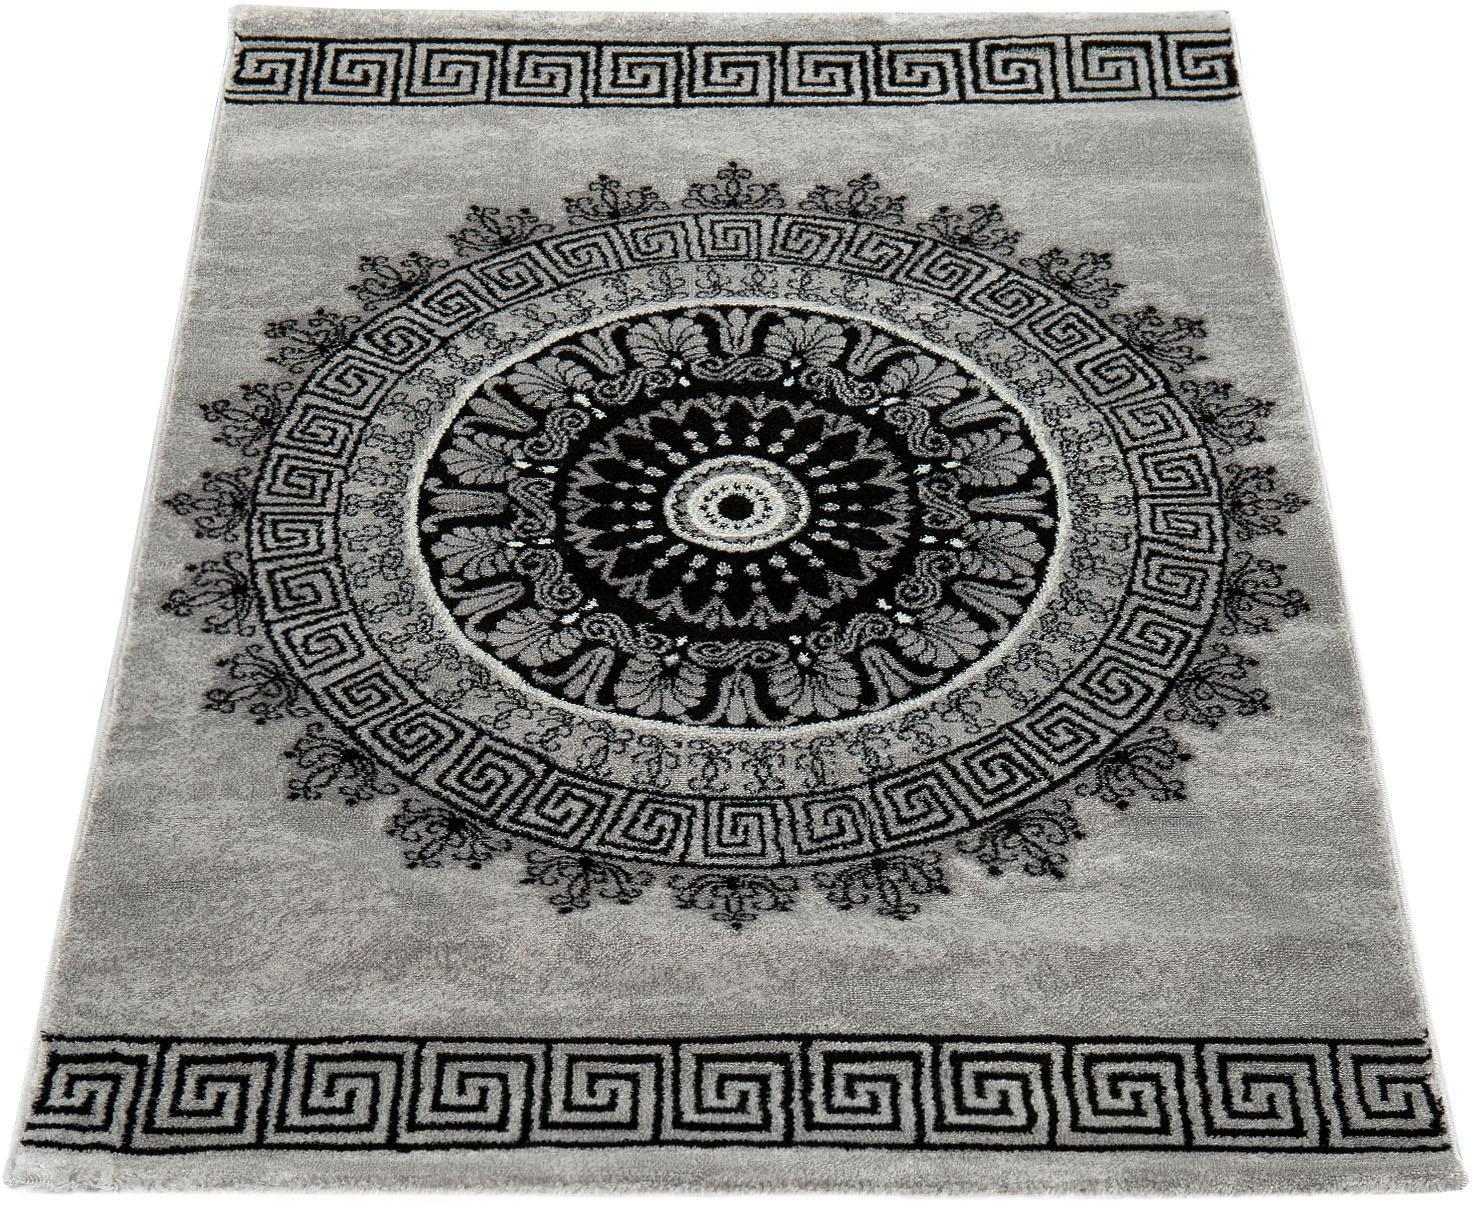 Teppich Tibesti 081 Paco Home rechteckig Höhe 16 mm